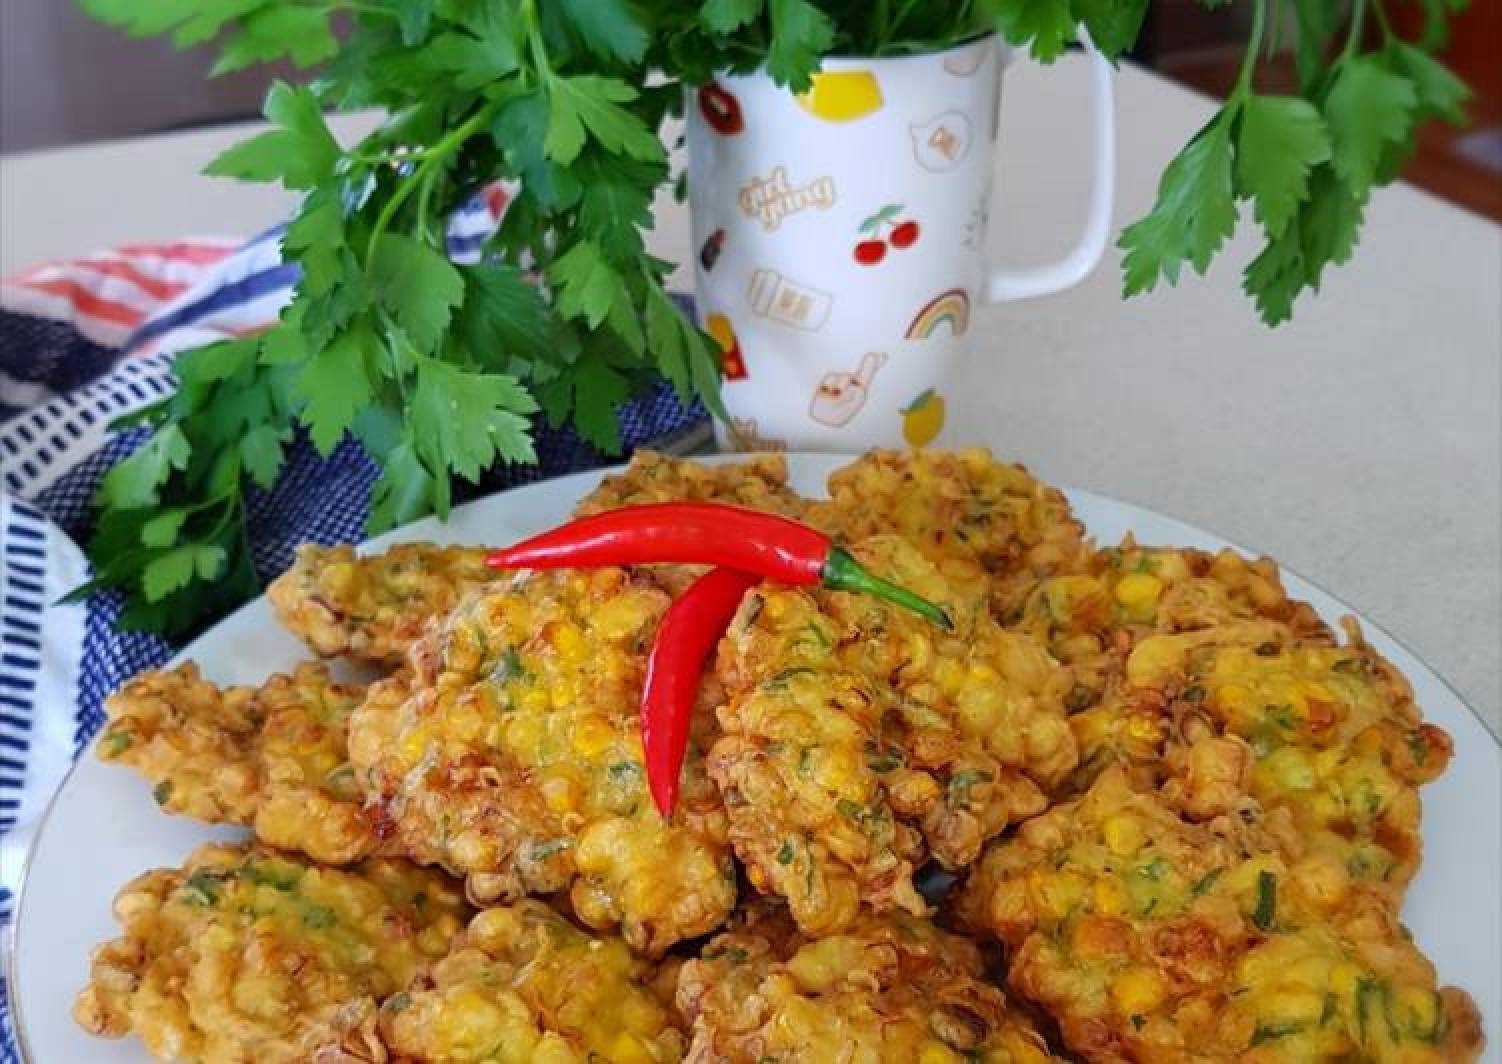 Indonesian Corn Fritters (Dadar Jagung or Perkedel Jagung)